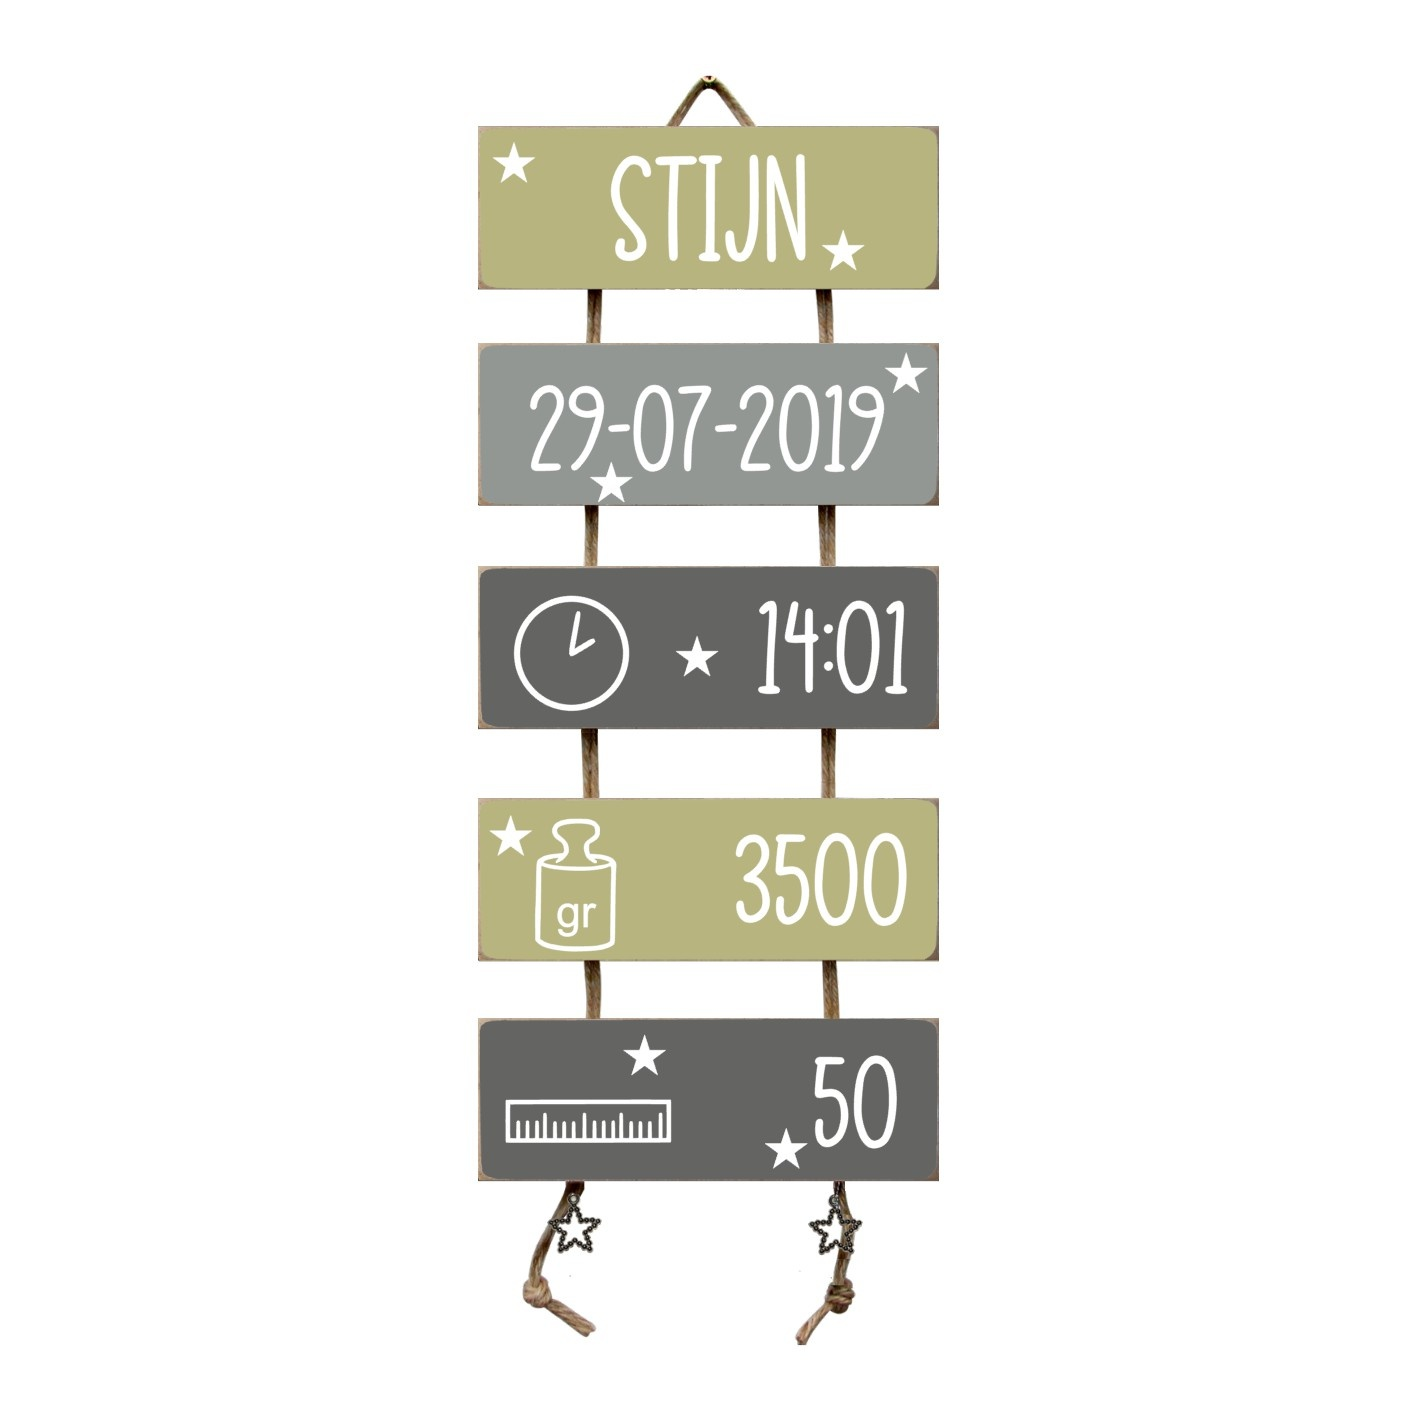 Kraamcadeau Geboorteladder Stijn Olive Tree/grijs